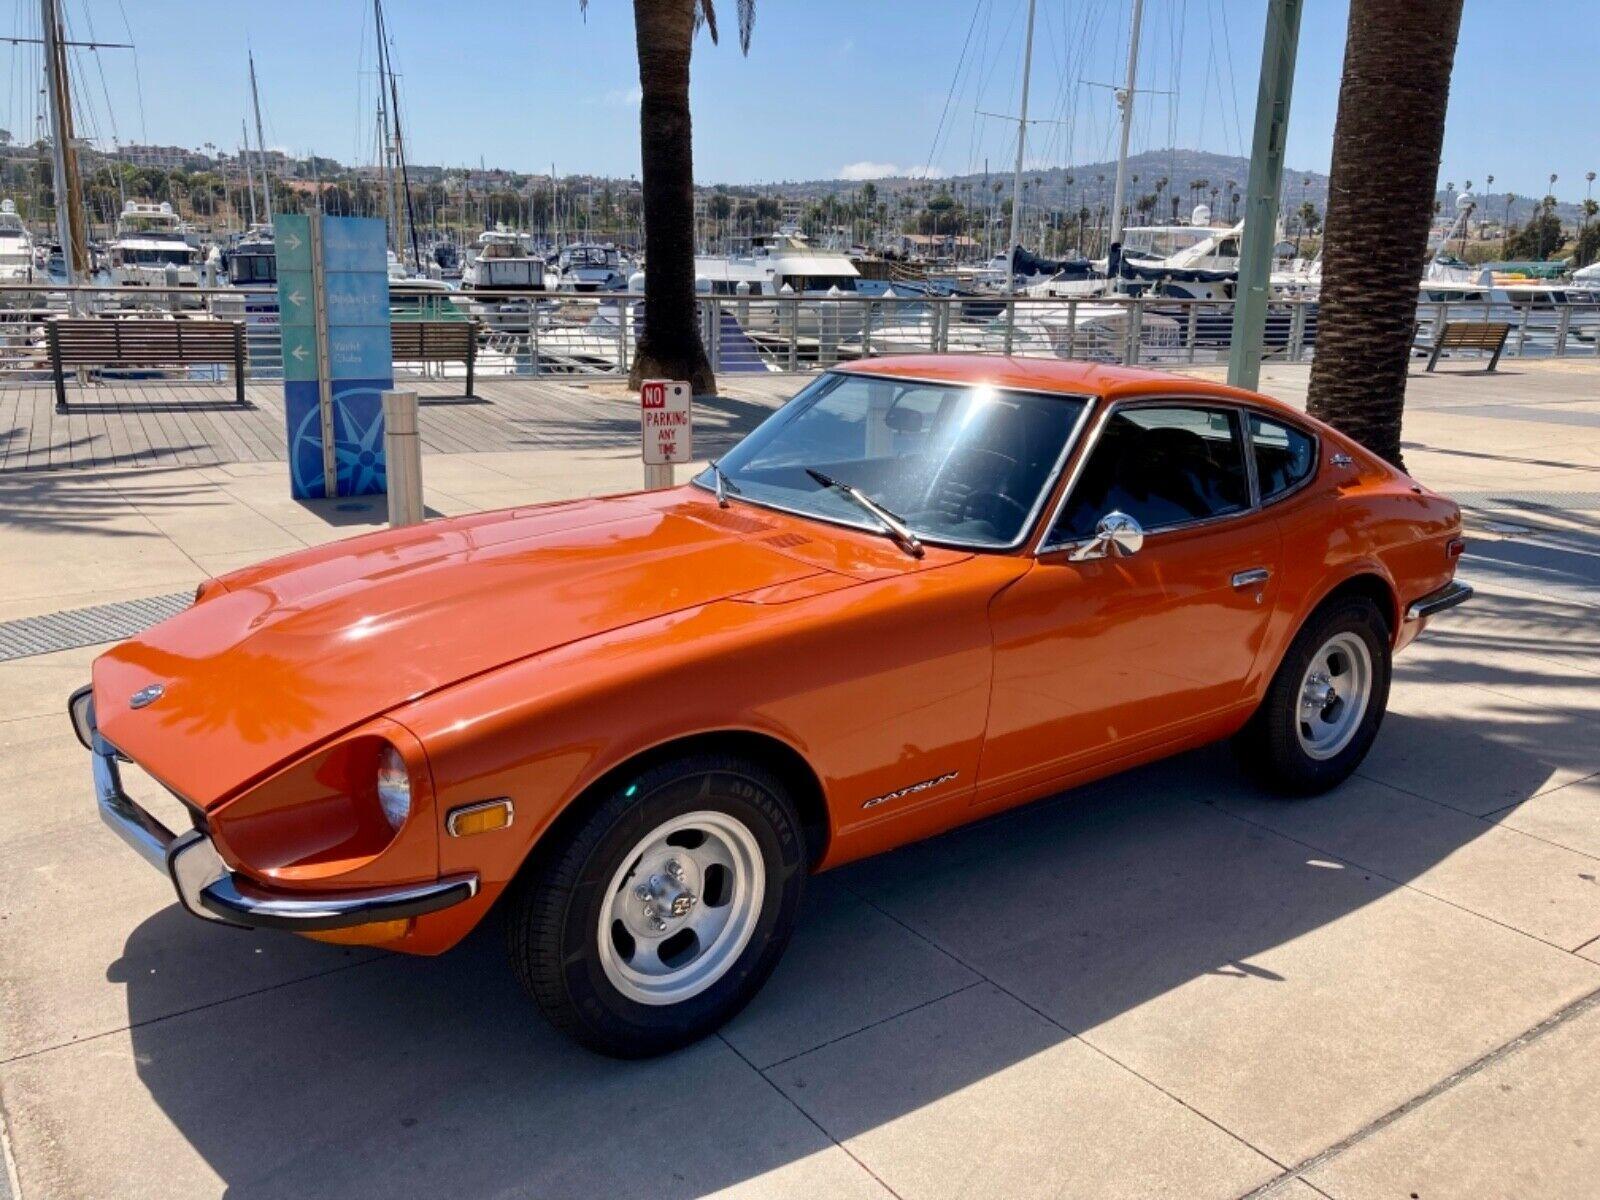 1970 Datsun 240z Series one California Classic